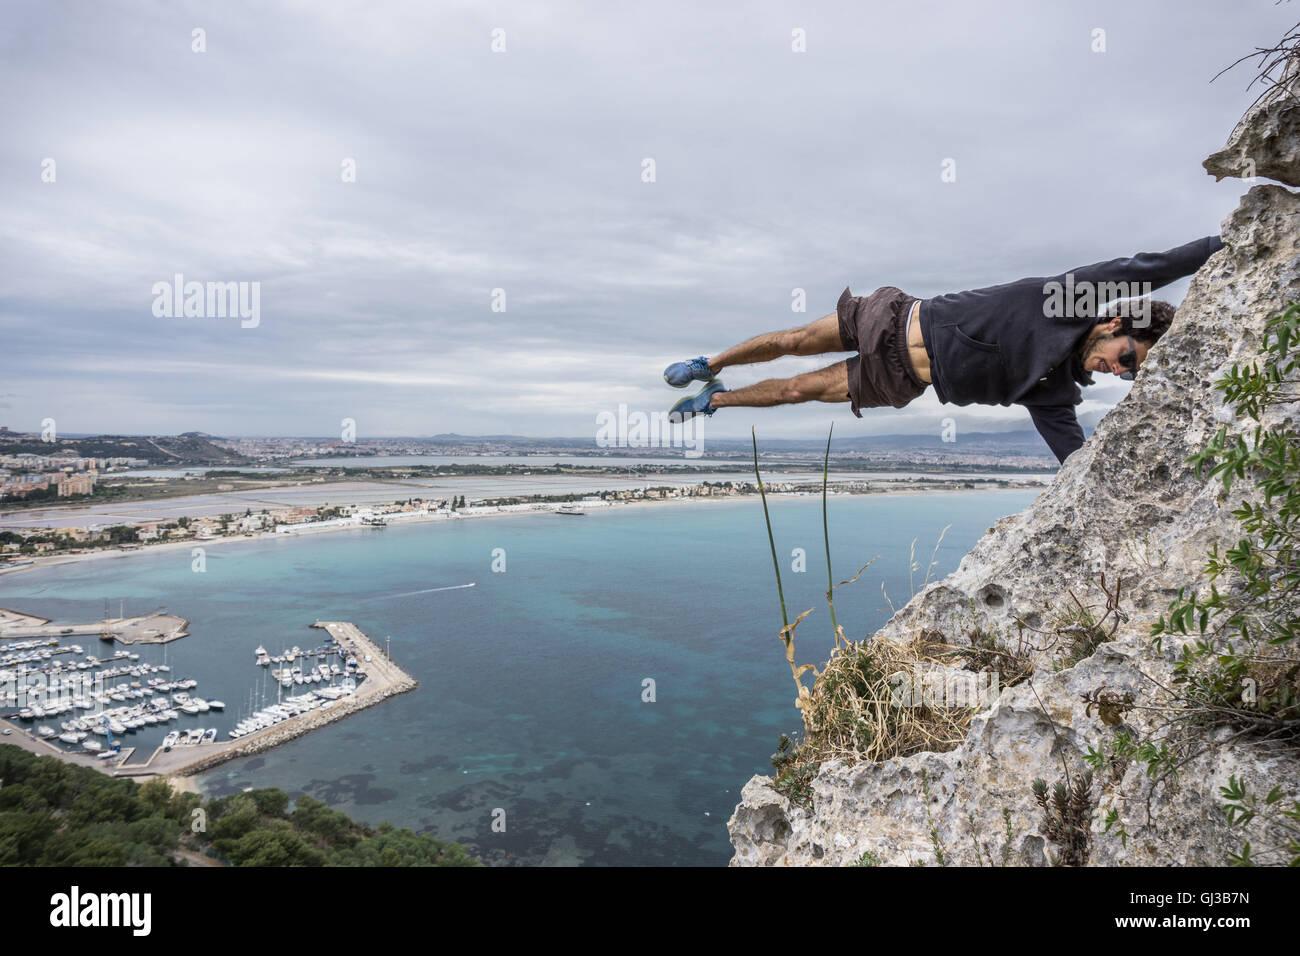 Male rock climber balancing horizontally mid air on coastal rock, Cagliari, Italy - Stock Image